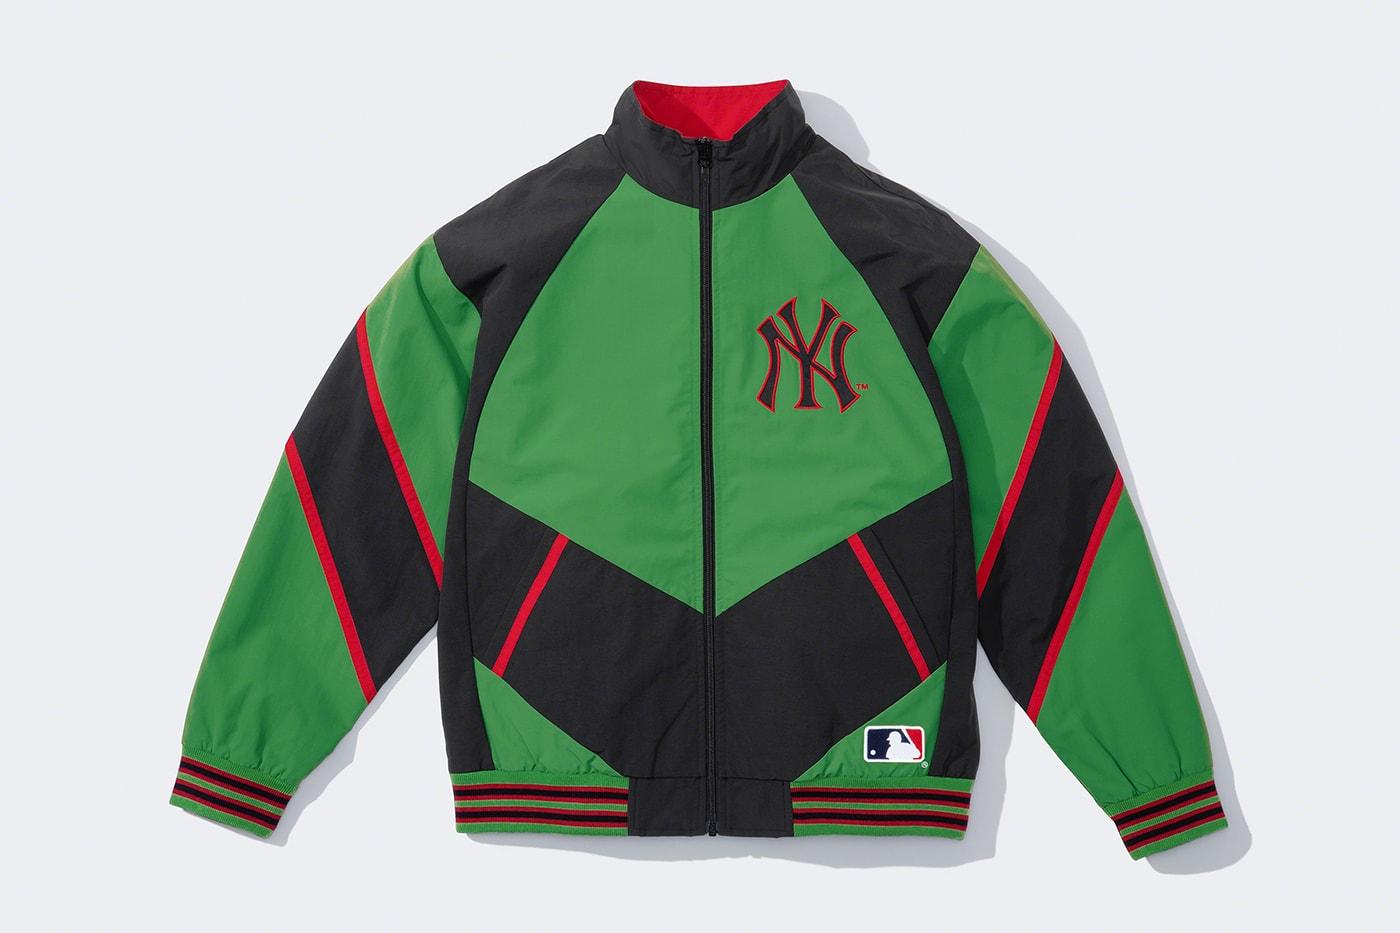 New York Yankees x Supreme Fall 2021 Collaboration